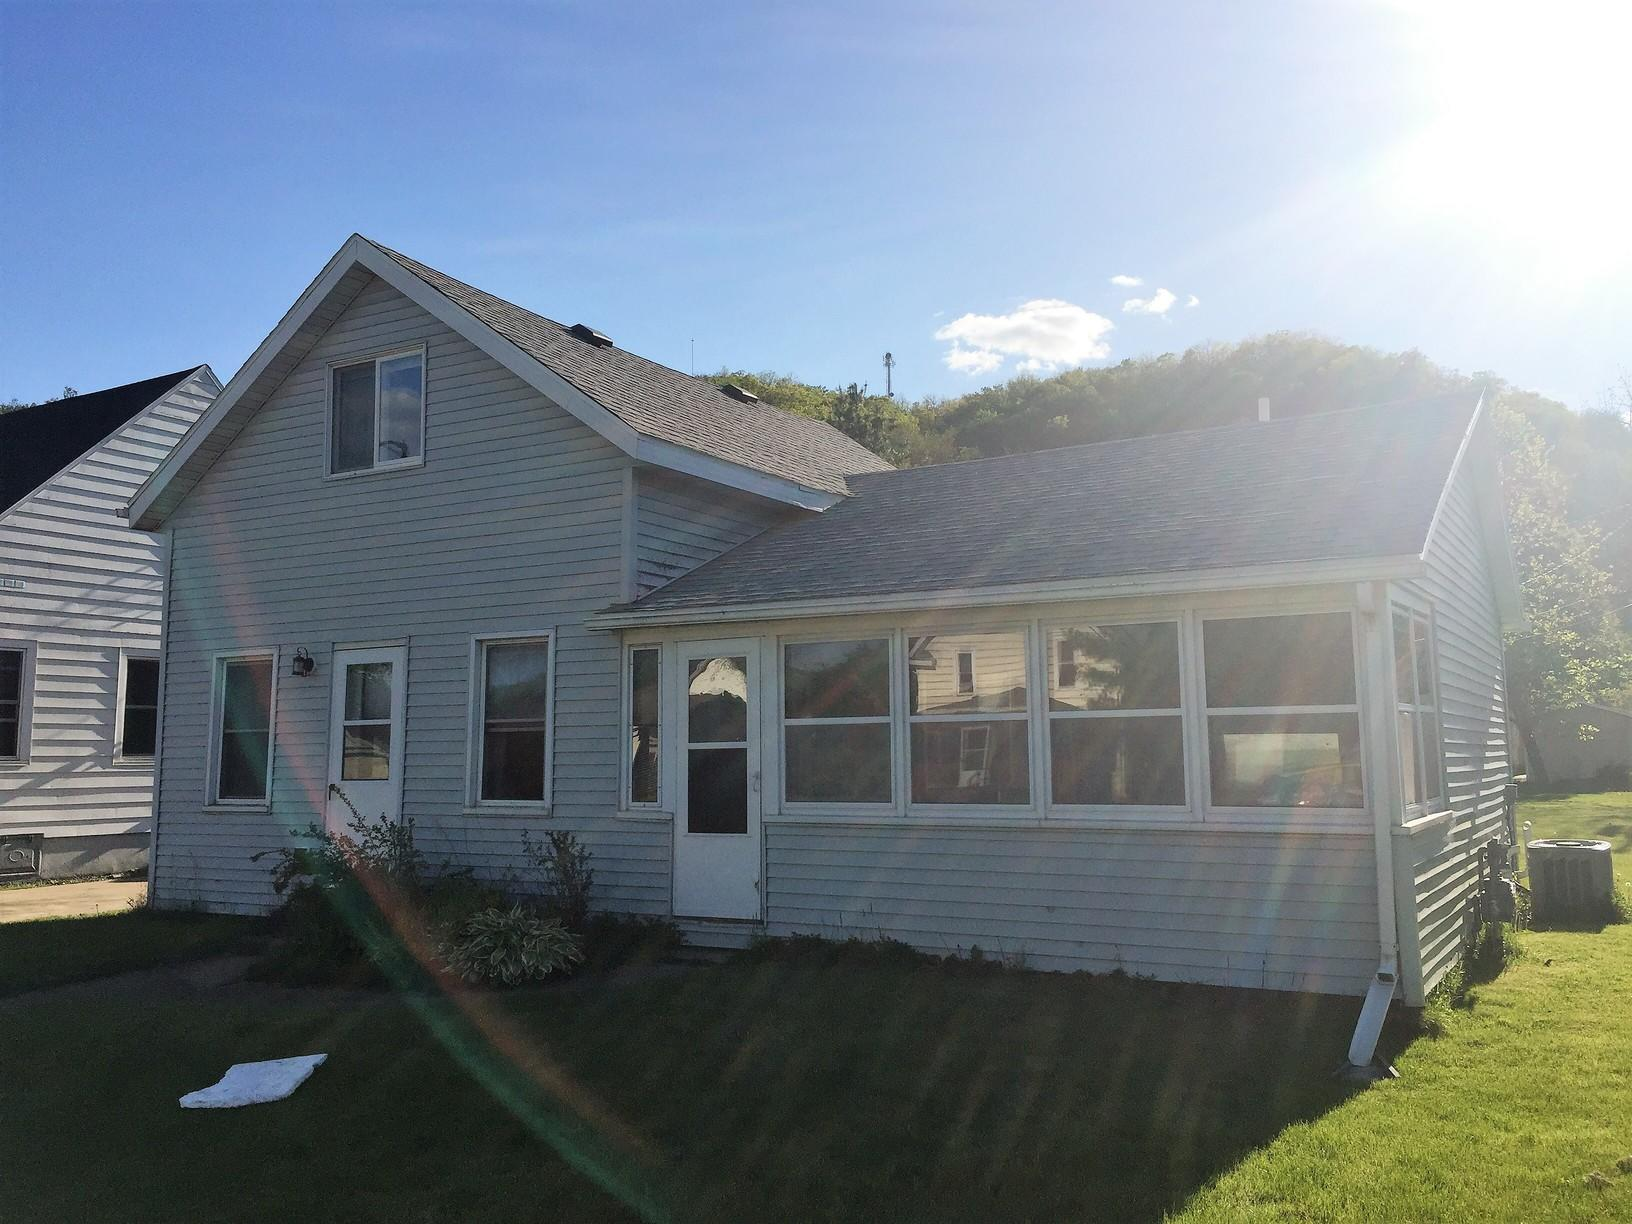 Platinum Hail Damage Repair in Rushford, MN - After Photo